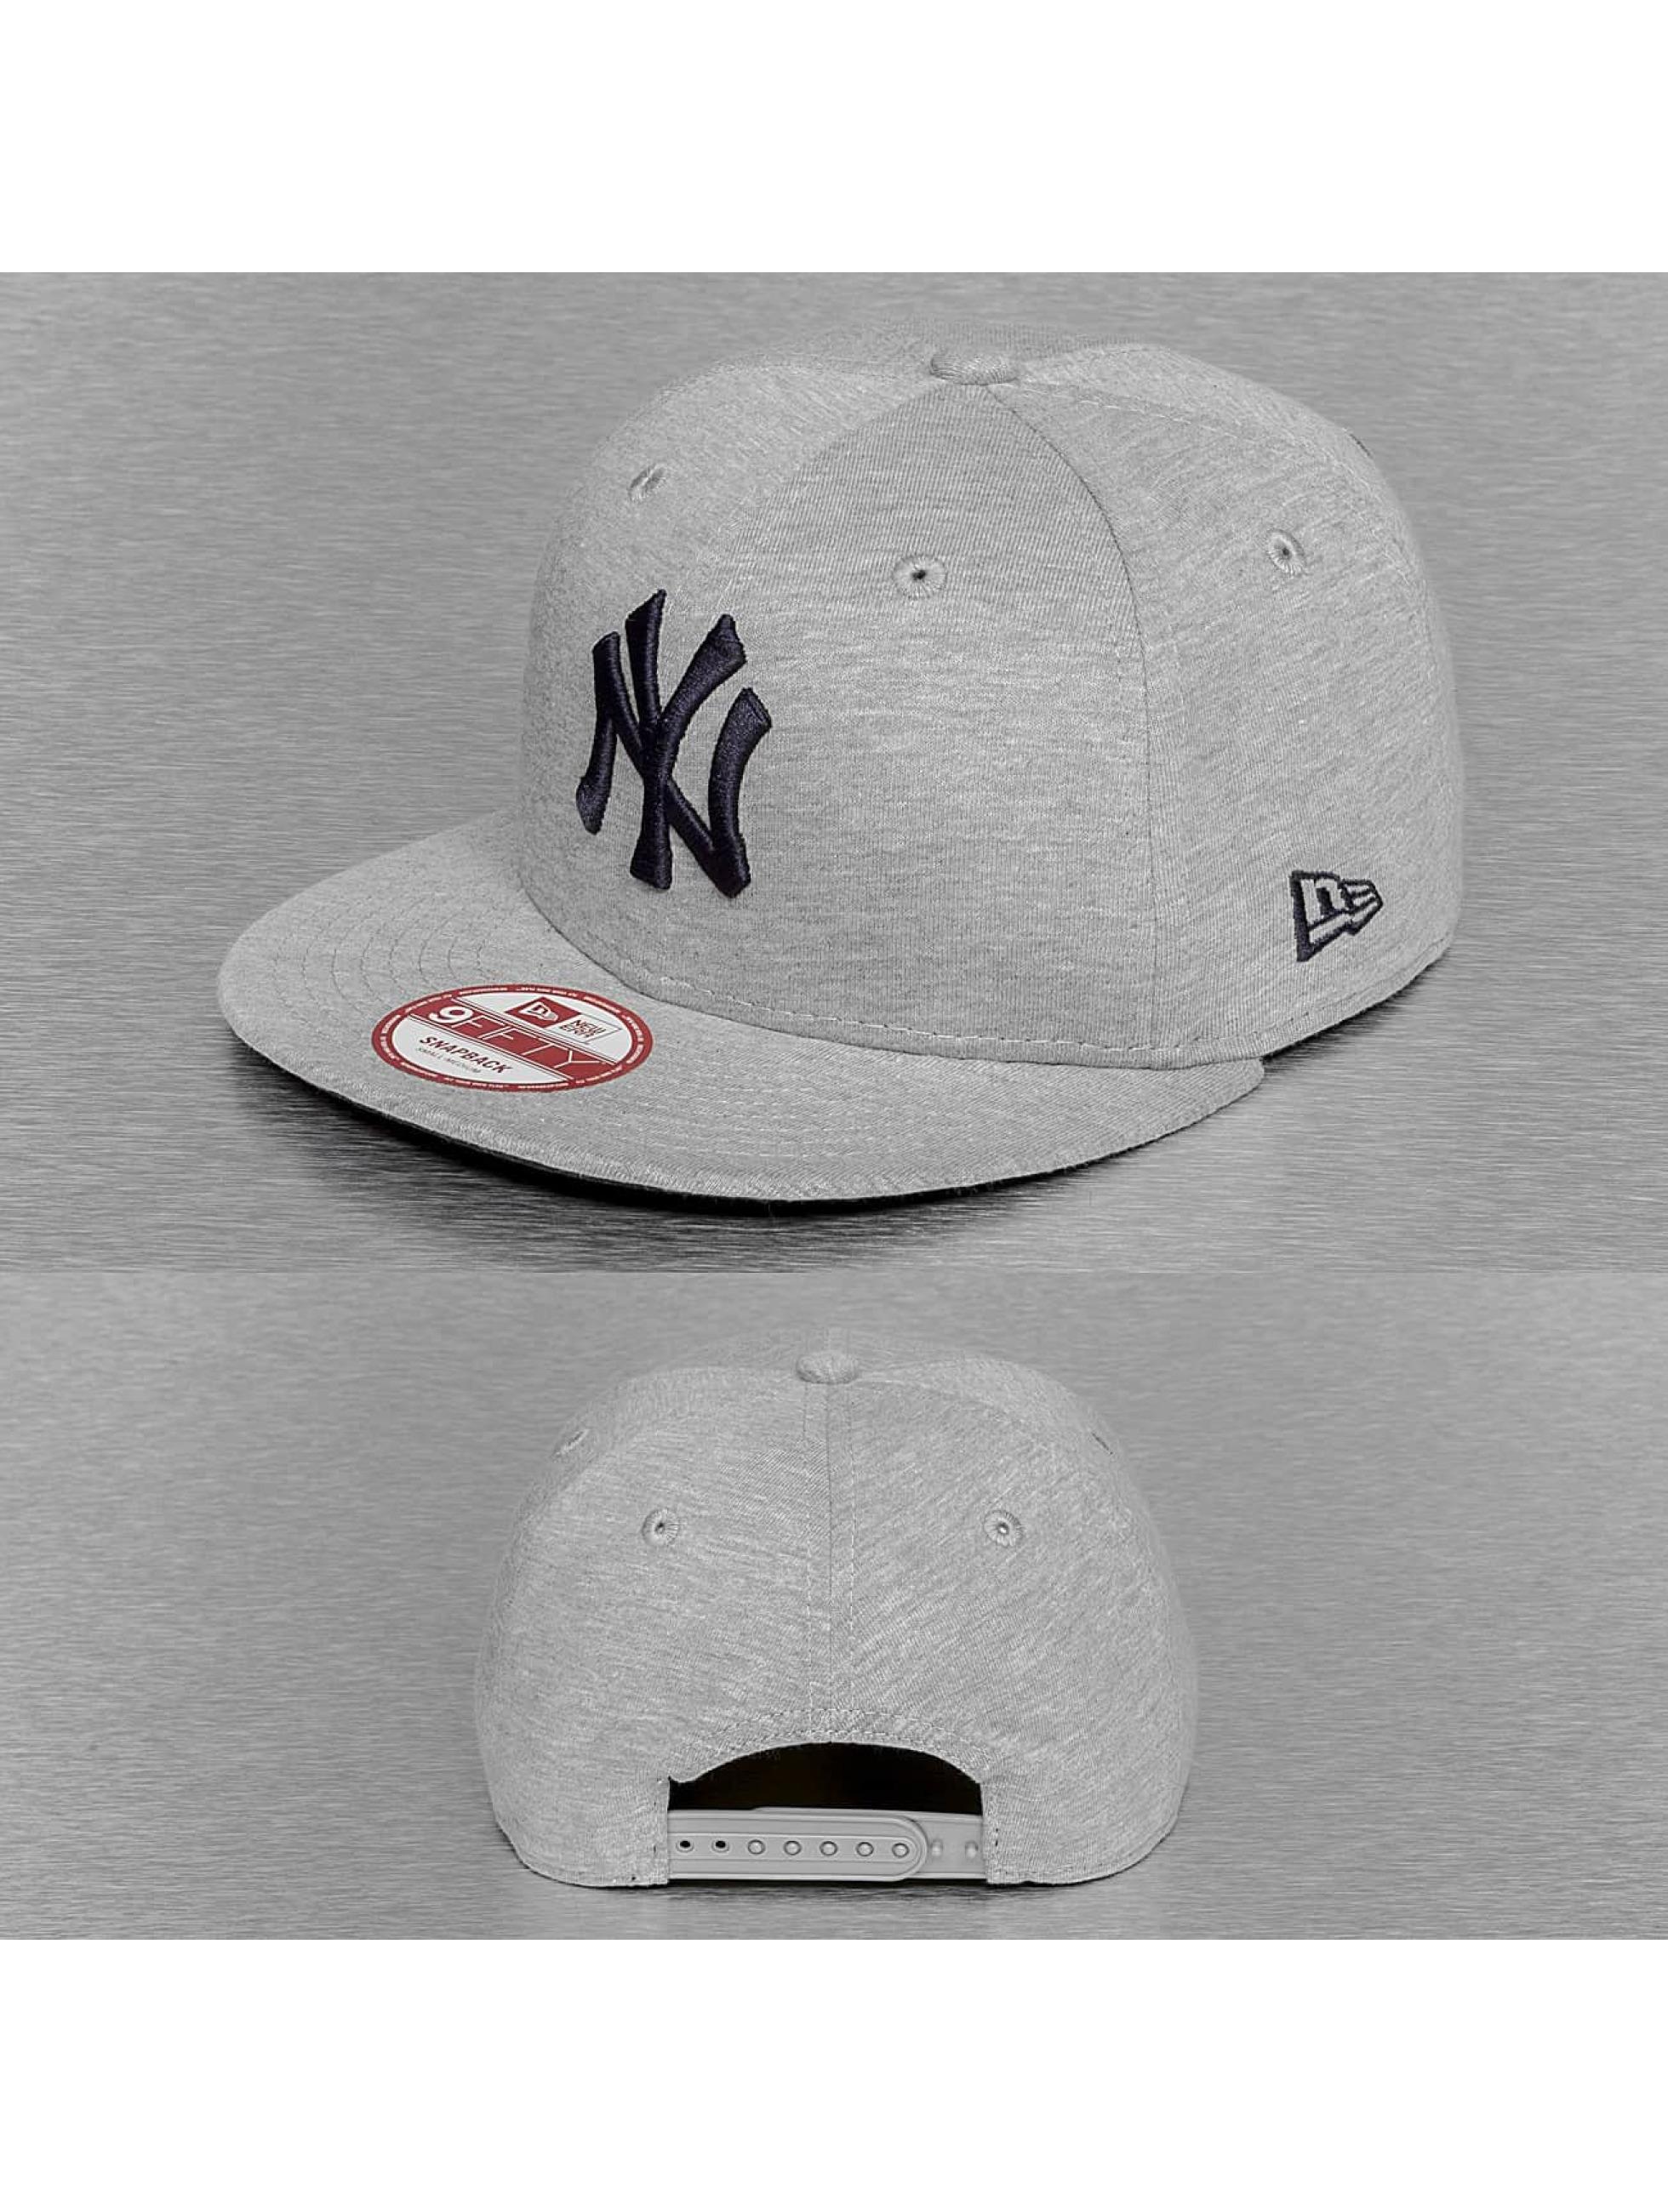 New Era Männer,Frauen Snapback Cap Jersey Team NY Yankees in grau